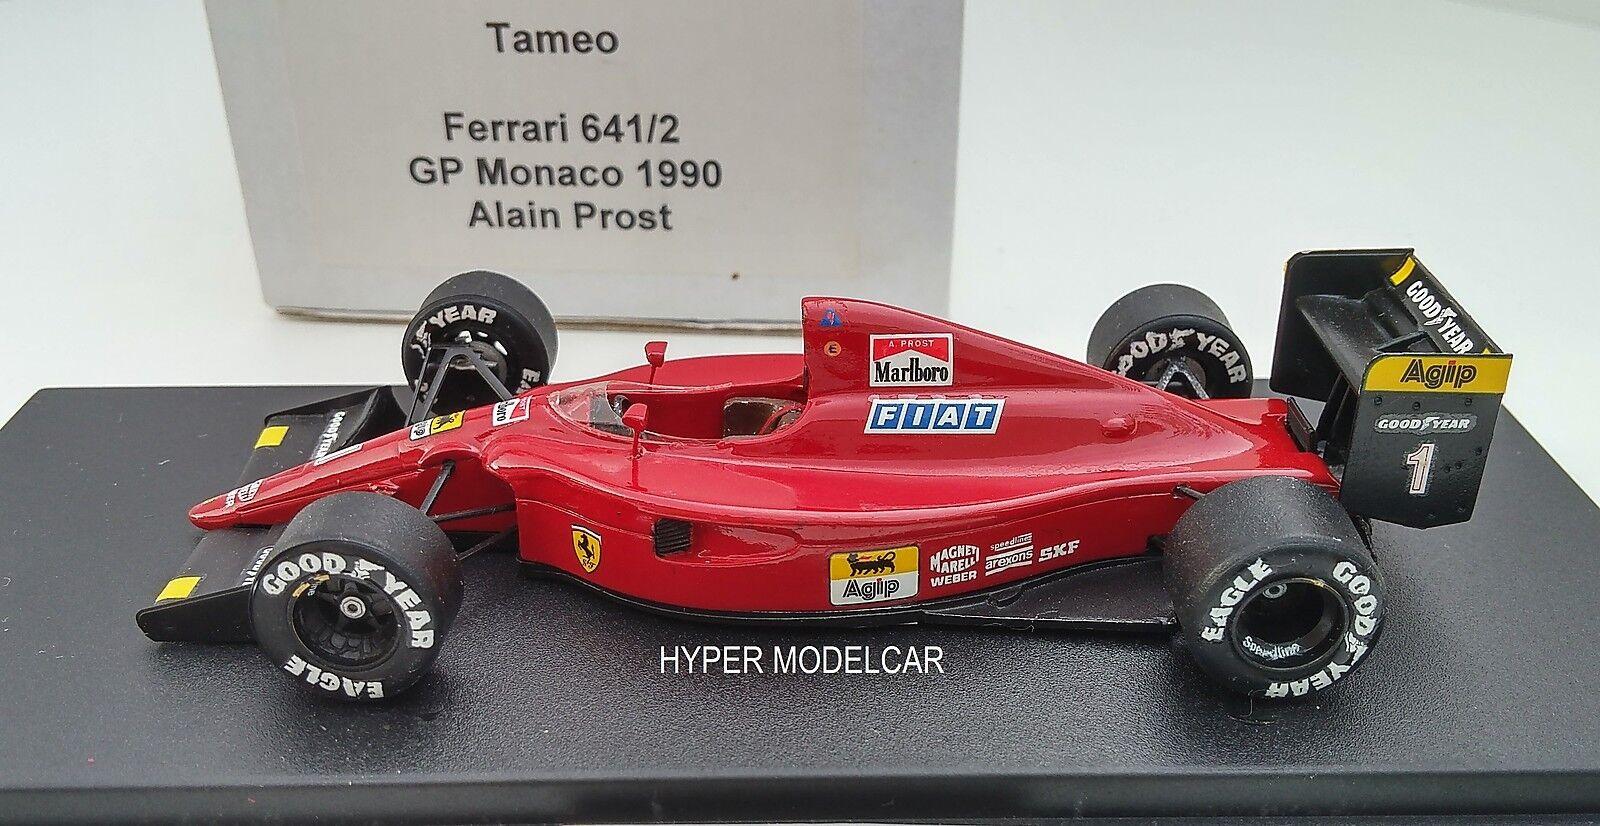 TAMEO KIT 1 43 F1 Ferrari 641 2 Gp Monaco 1992 A. Prost